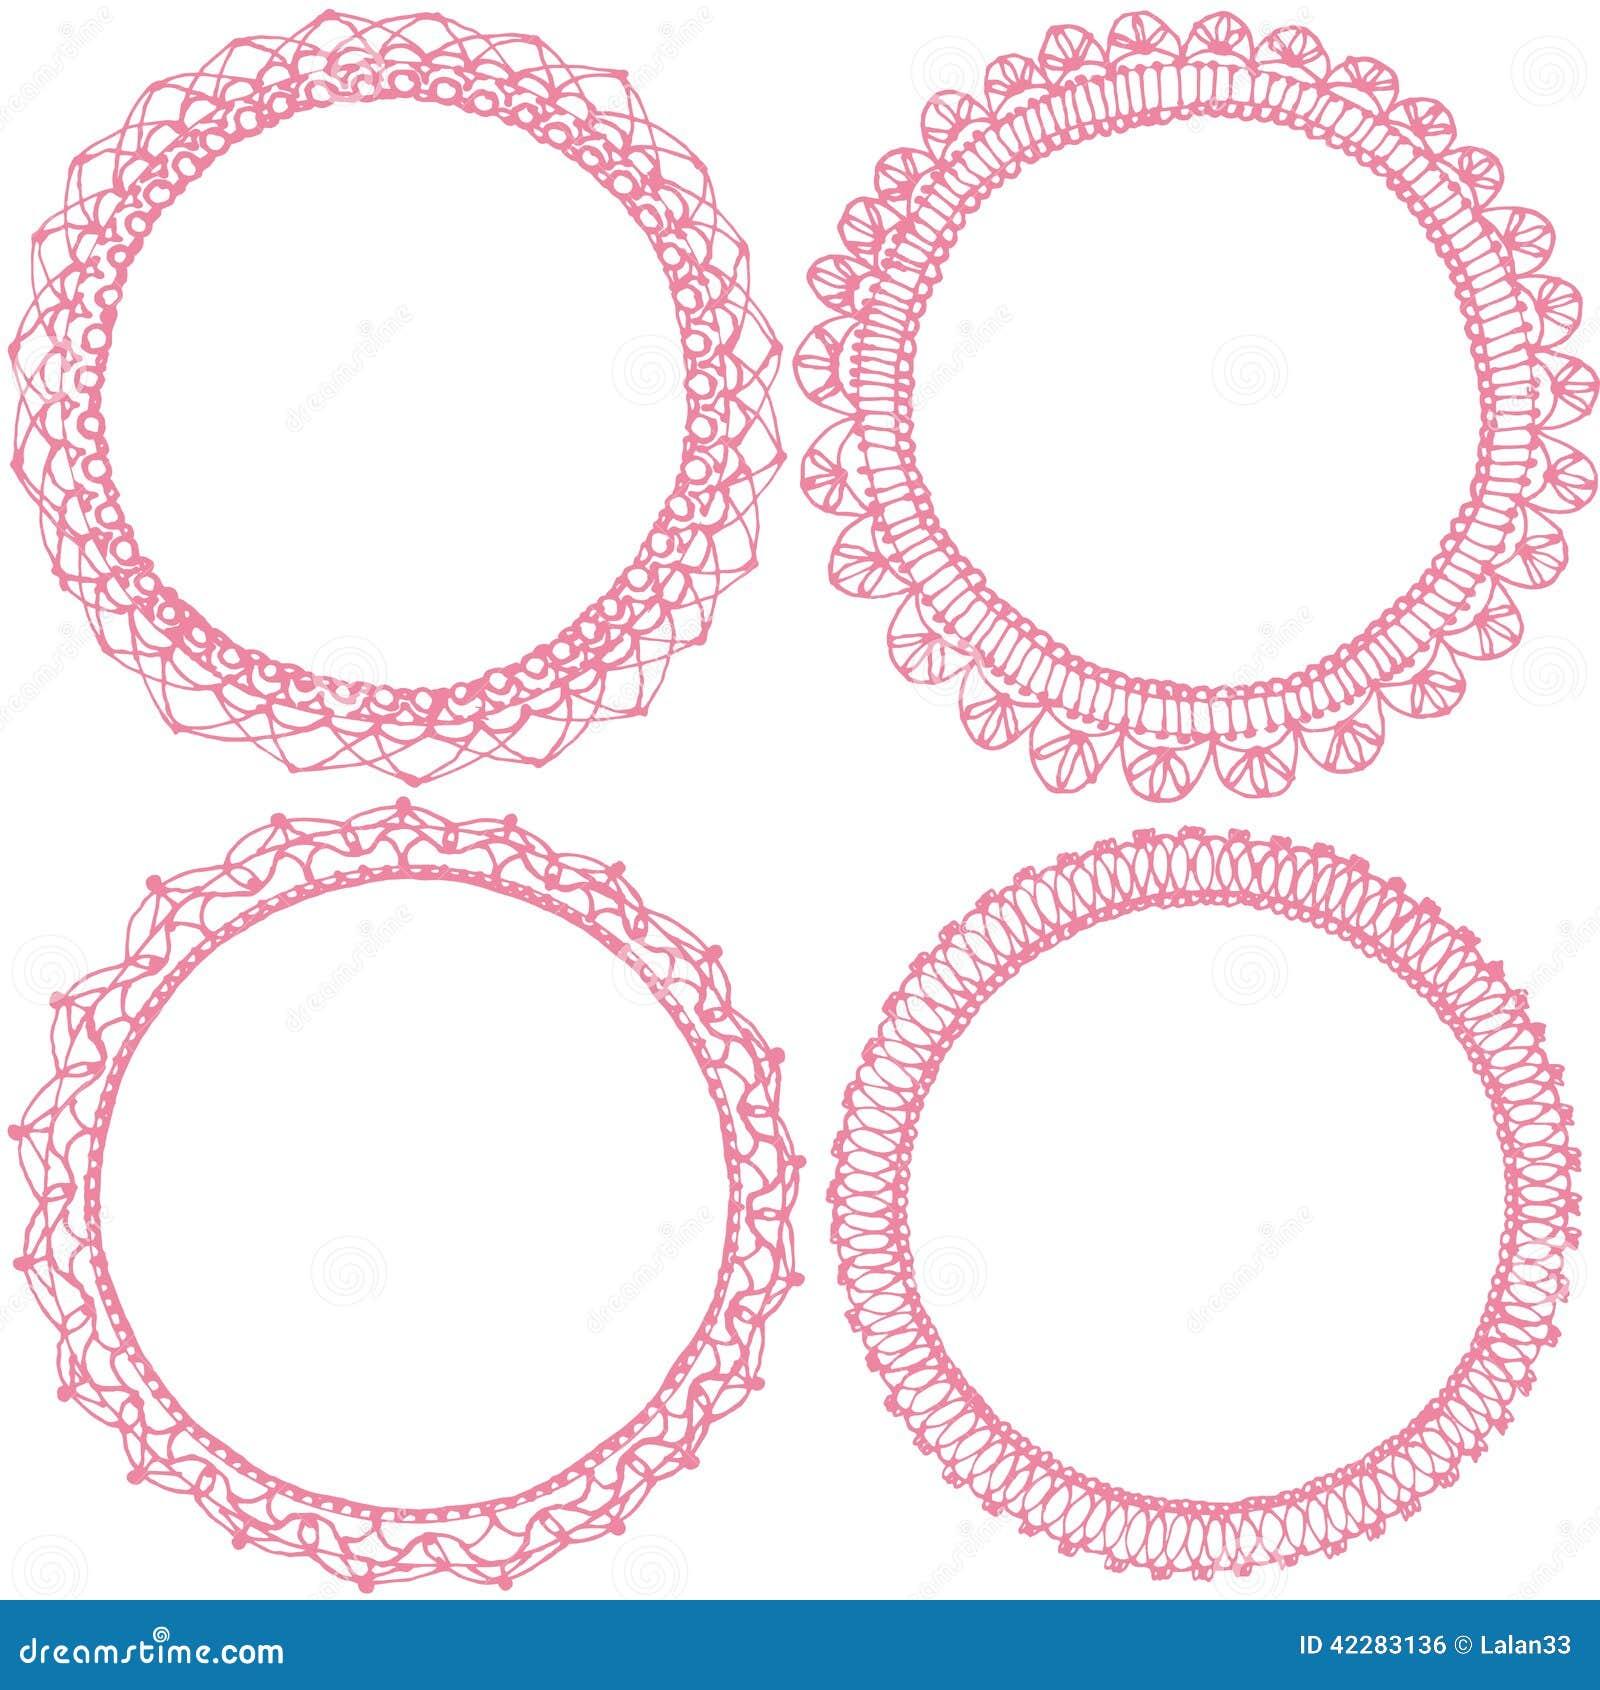 circle lace frames royalty free stock image